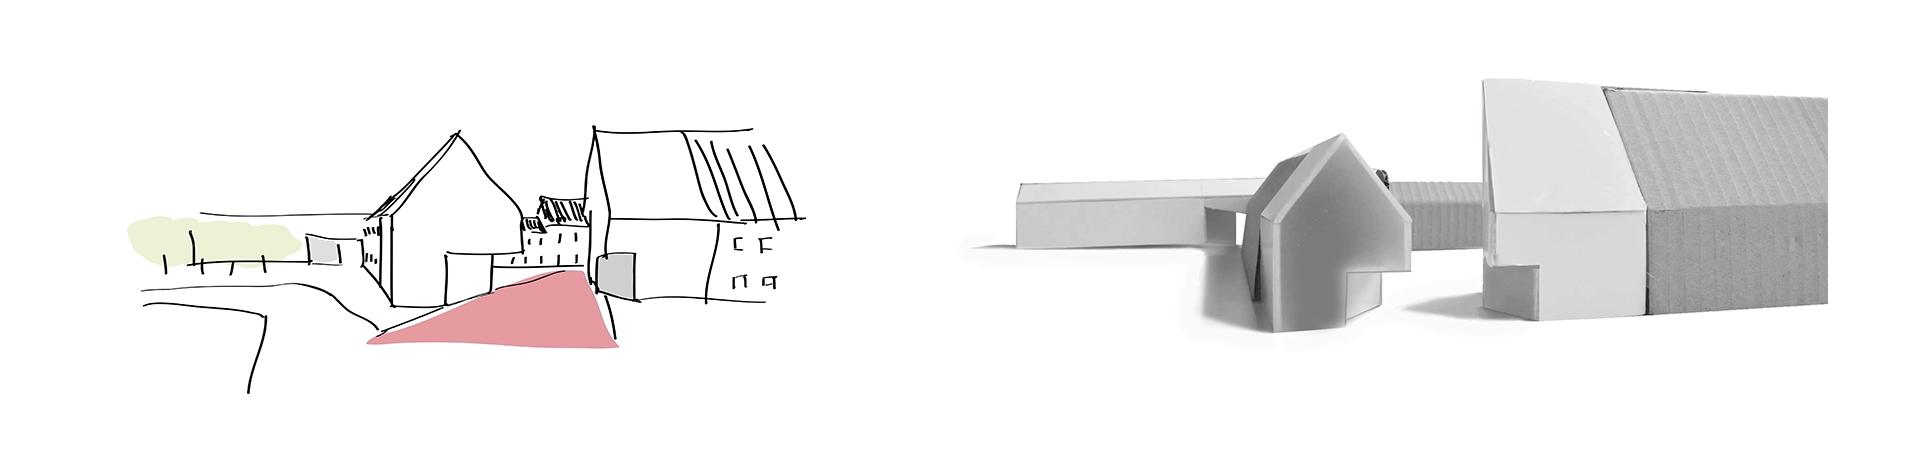 proyectos-ideacion-estrategias-luis-alvarez-arquitecto_2.jpg